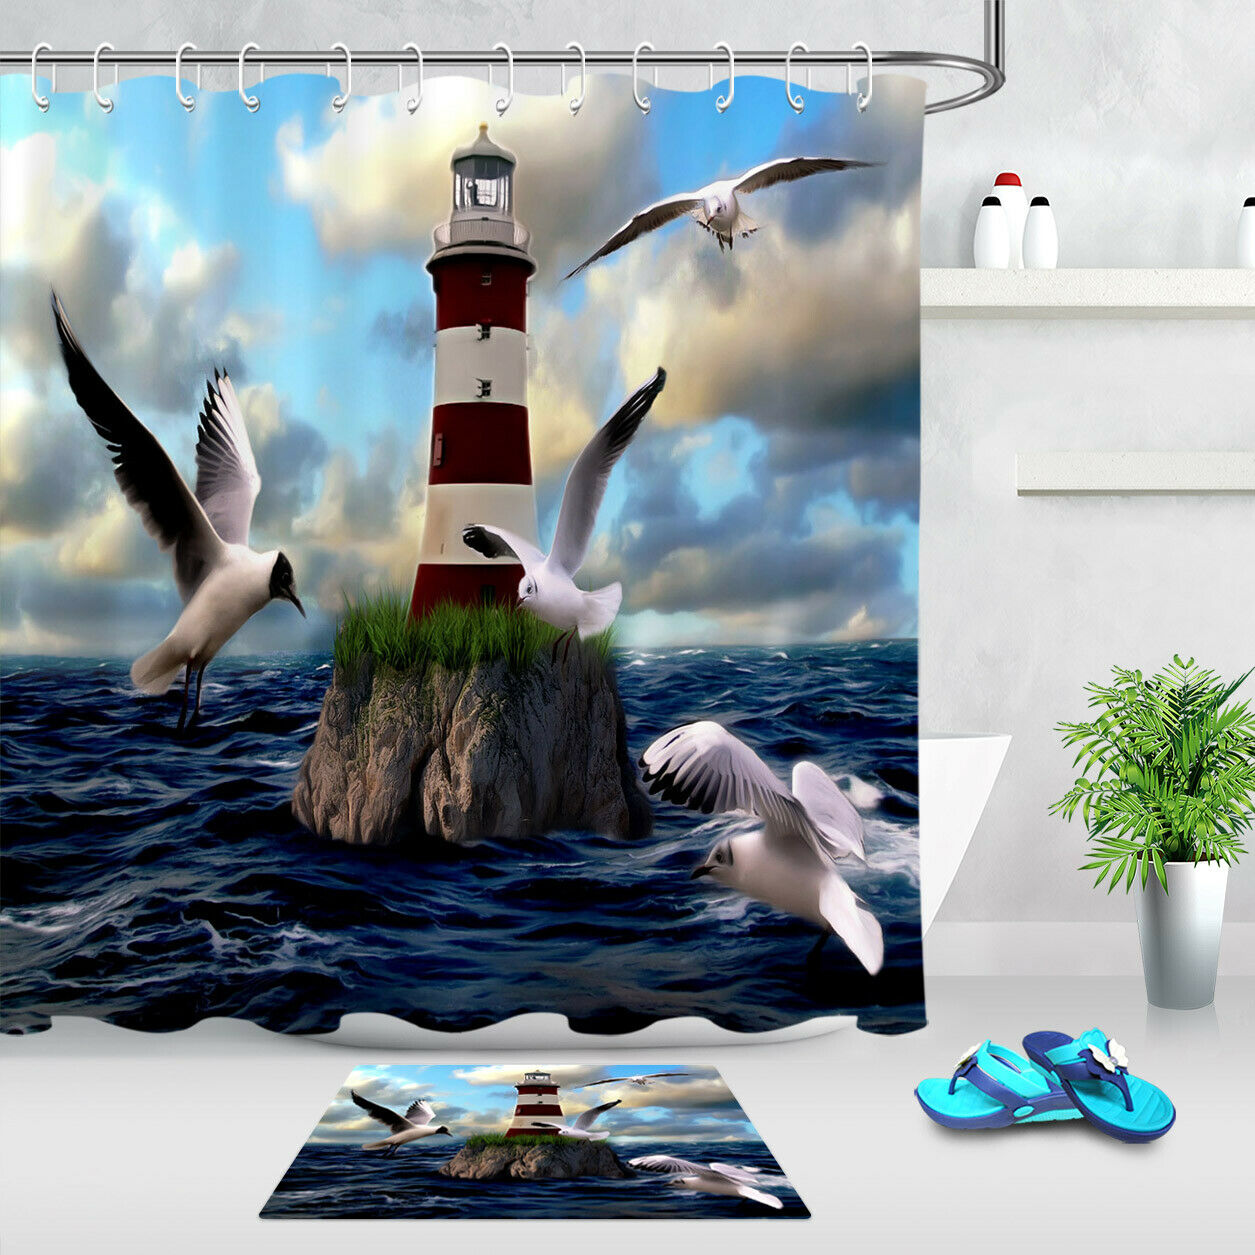 100/% Polyester Fabric Seagulls on the Sea Shore Shower Curtain Animal Bath Mat